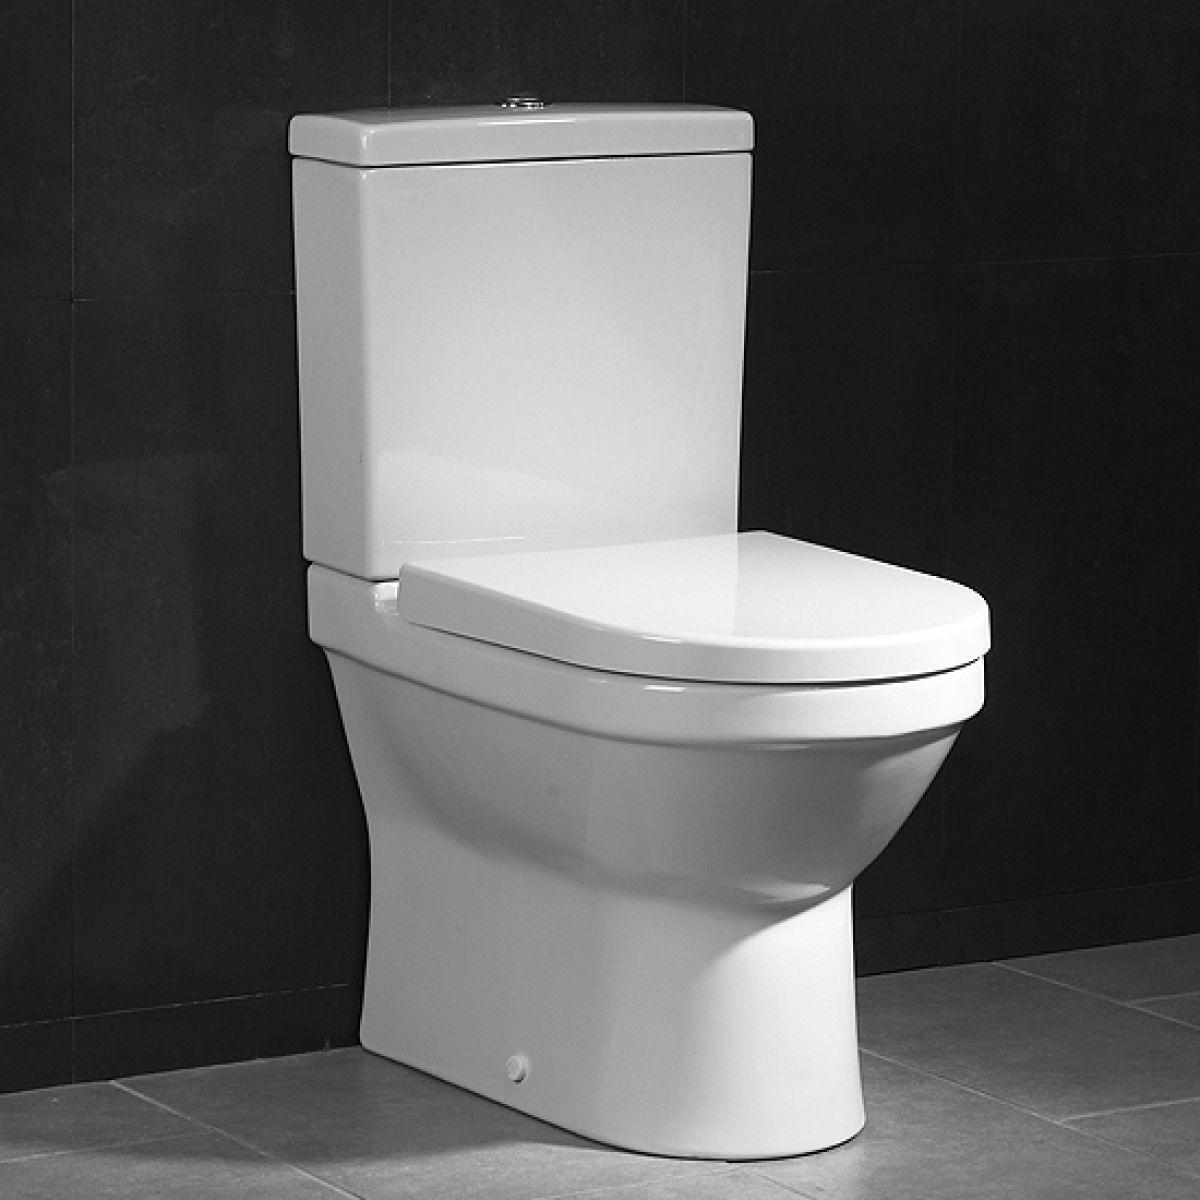 vitra s50 close coupled toilet uk bathrooms. Black Bedroom Furniture Sets. Home Design Ideas